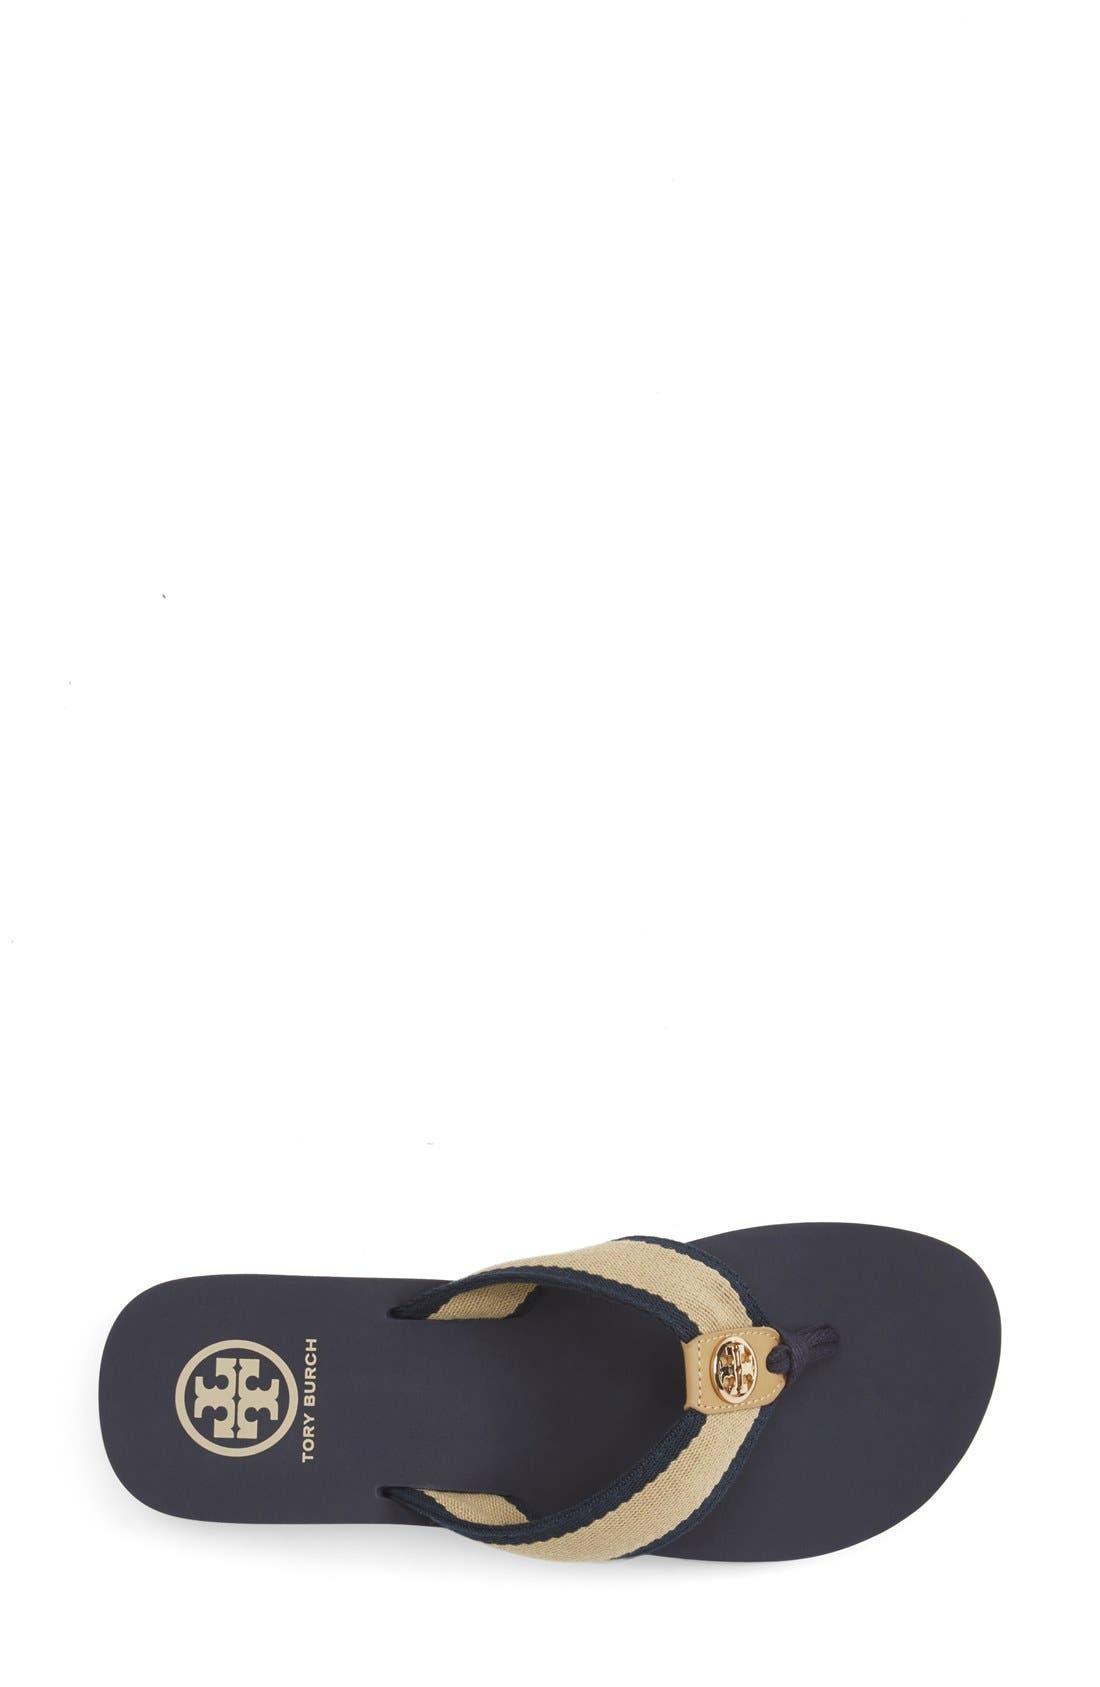 Alternate Image 4  - Tory Burch 'Frankie' Wedge Sandal (Women) (Nordstrom Exclusive)